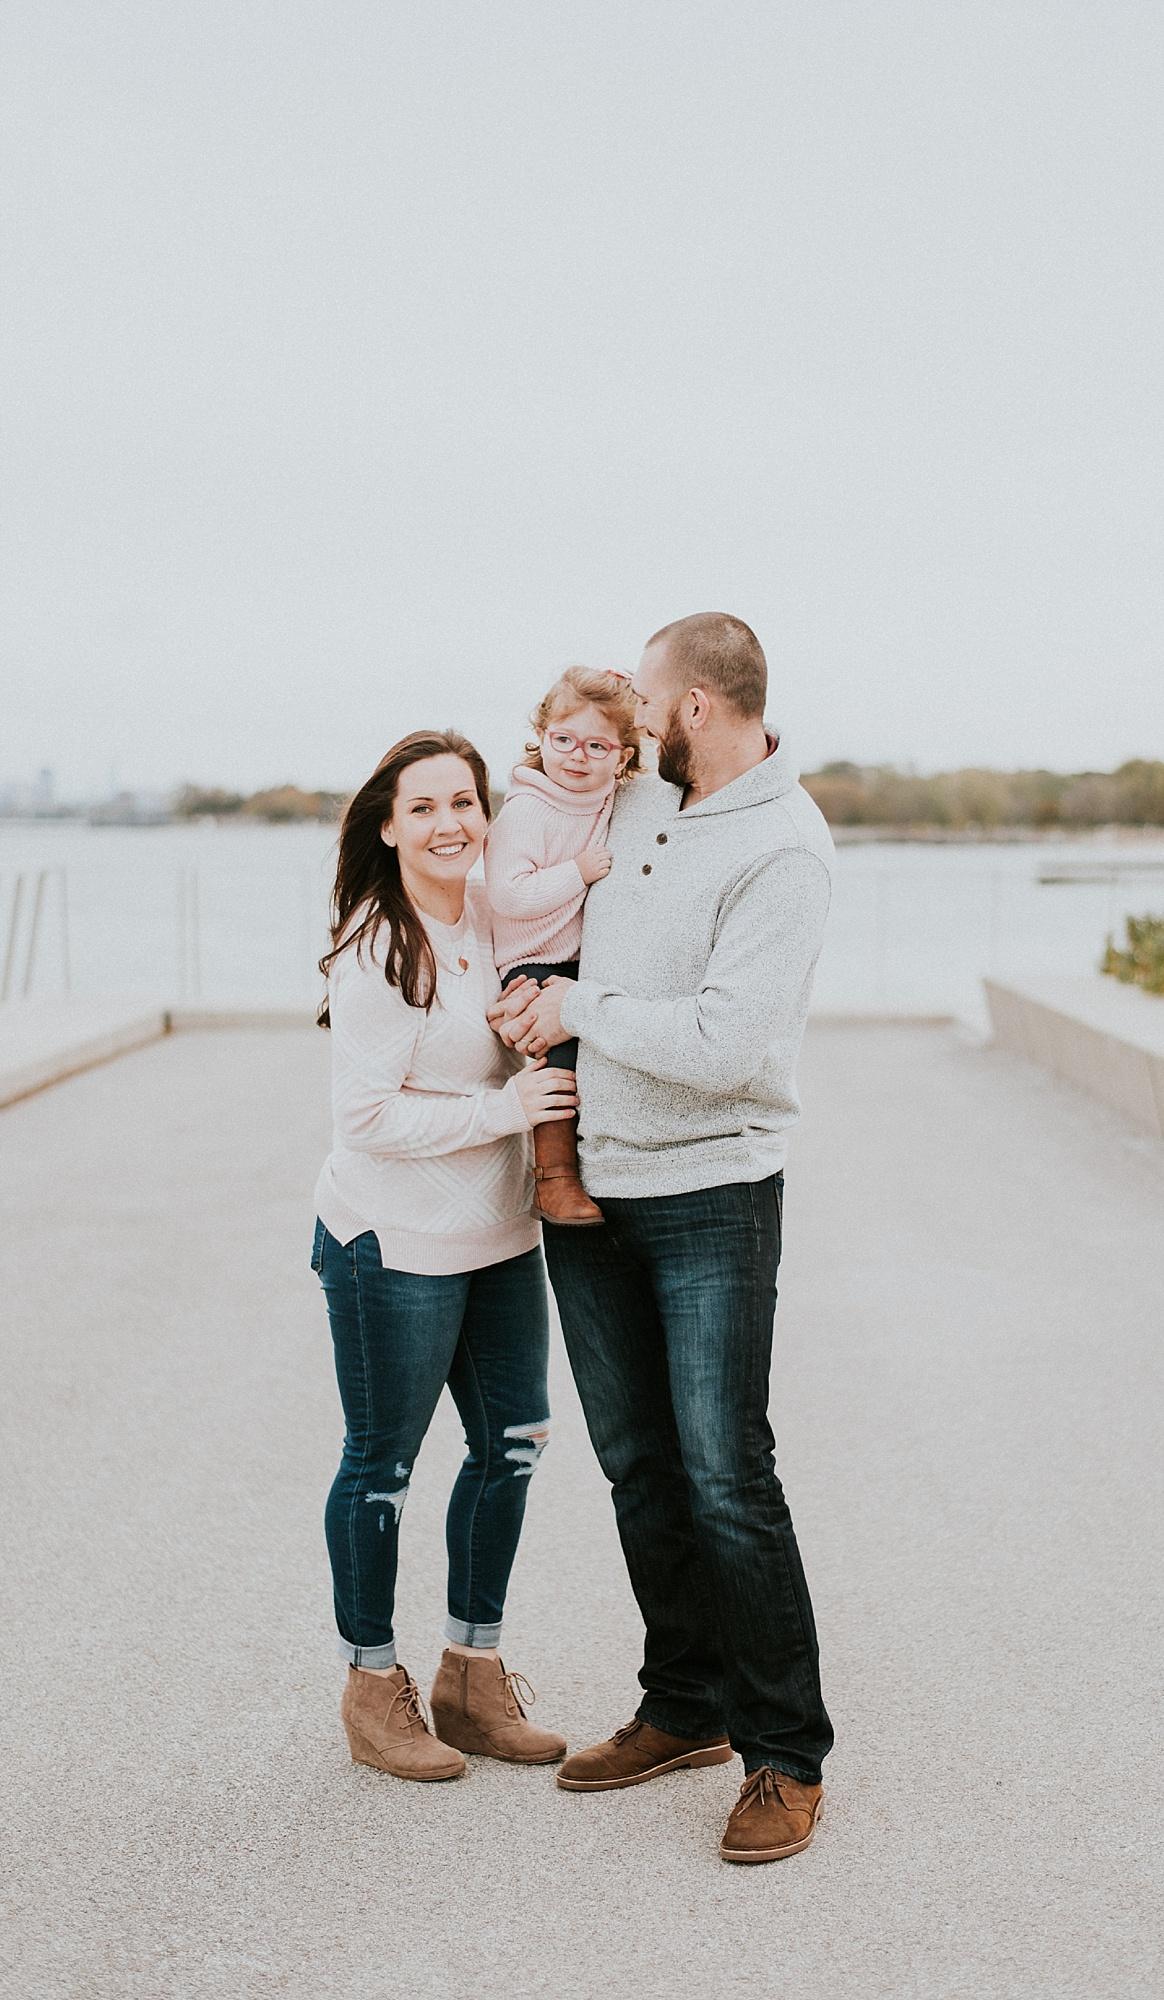 CHICAGO-MATERNITY-FAMILY-PHOTOGRAPHER-LISH-MARIE_0383.jpg